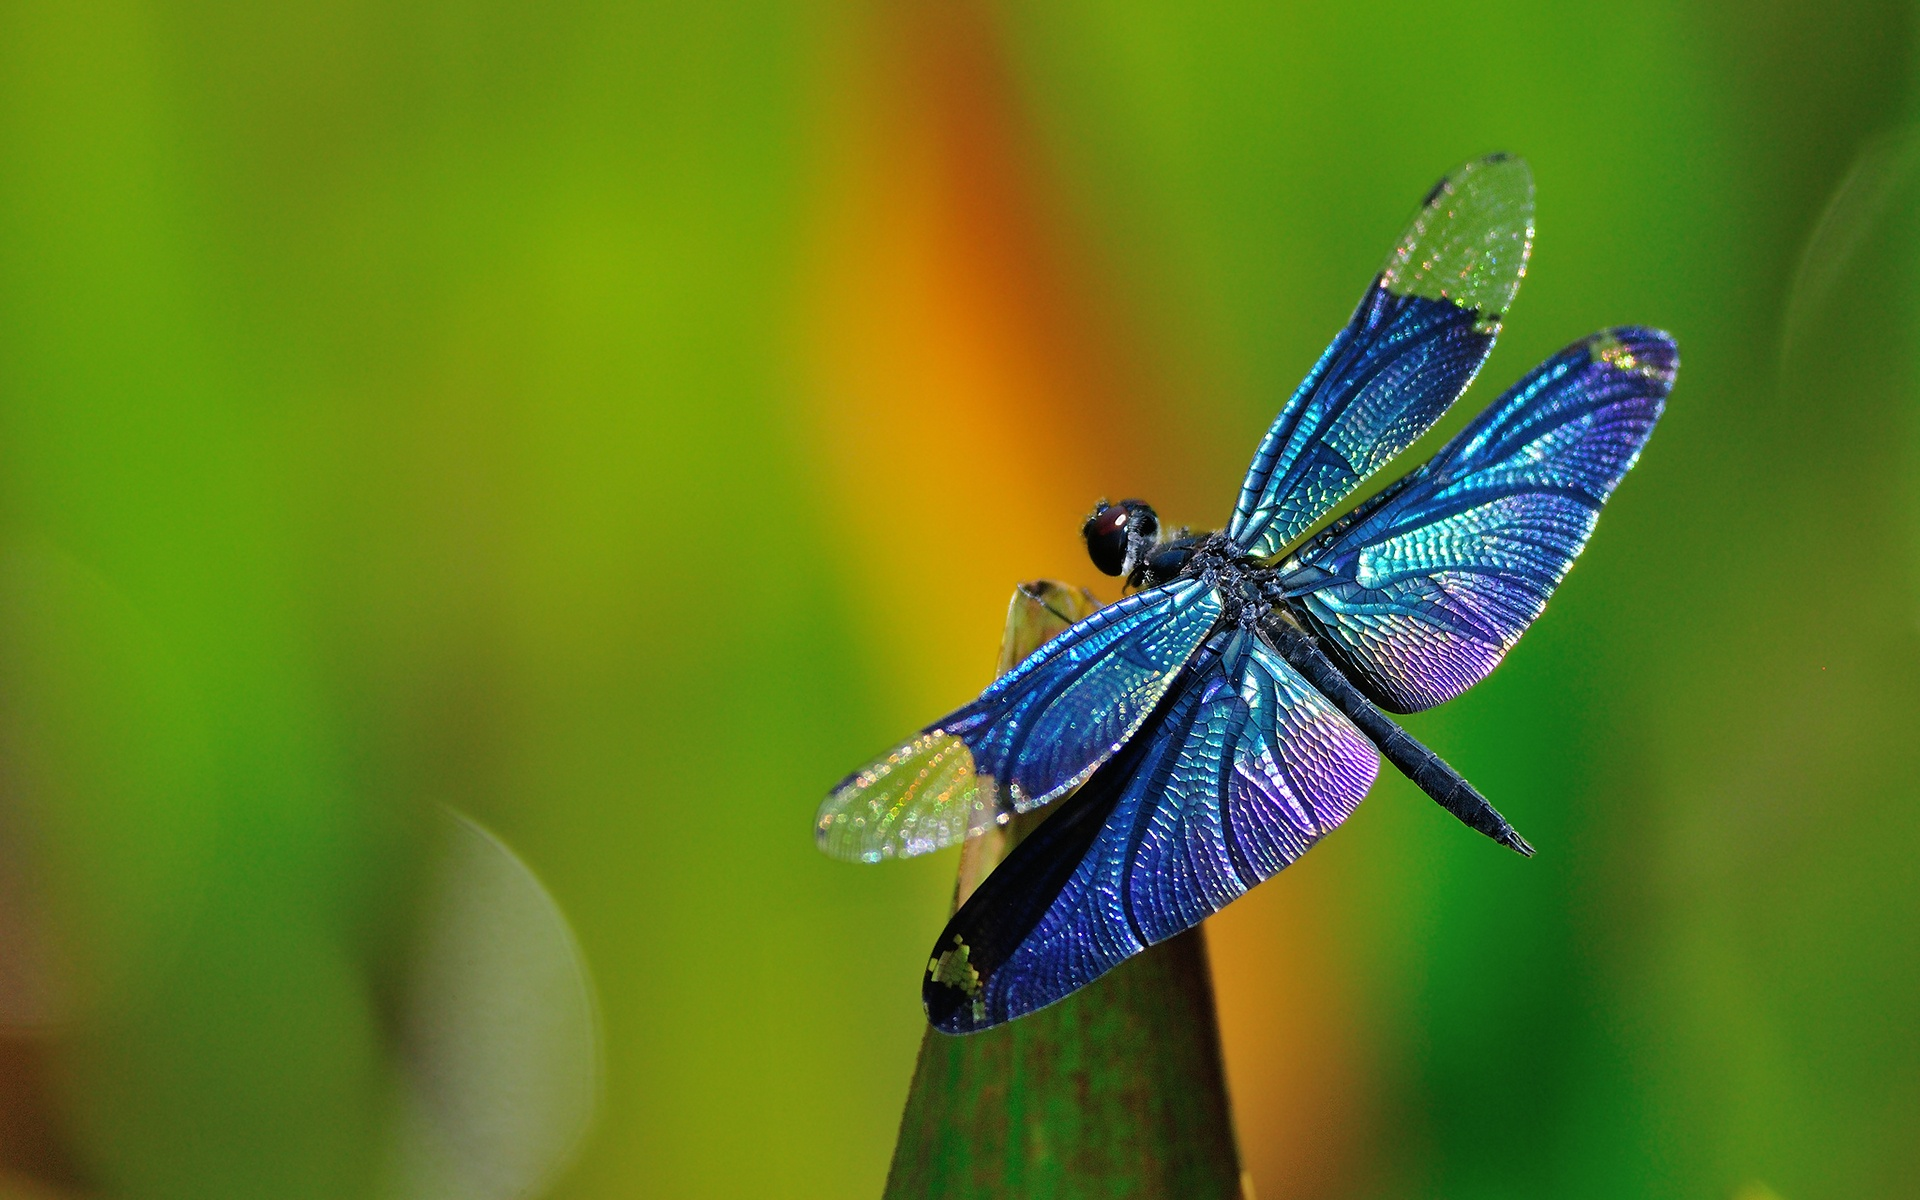 dragonfly desktop wallpaper 49544 1920x1200 px ~ hdwallsource